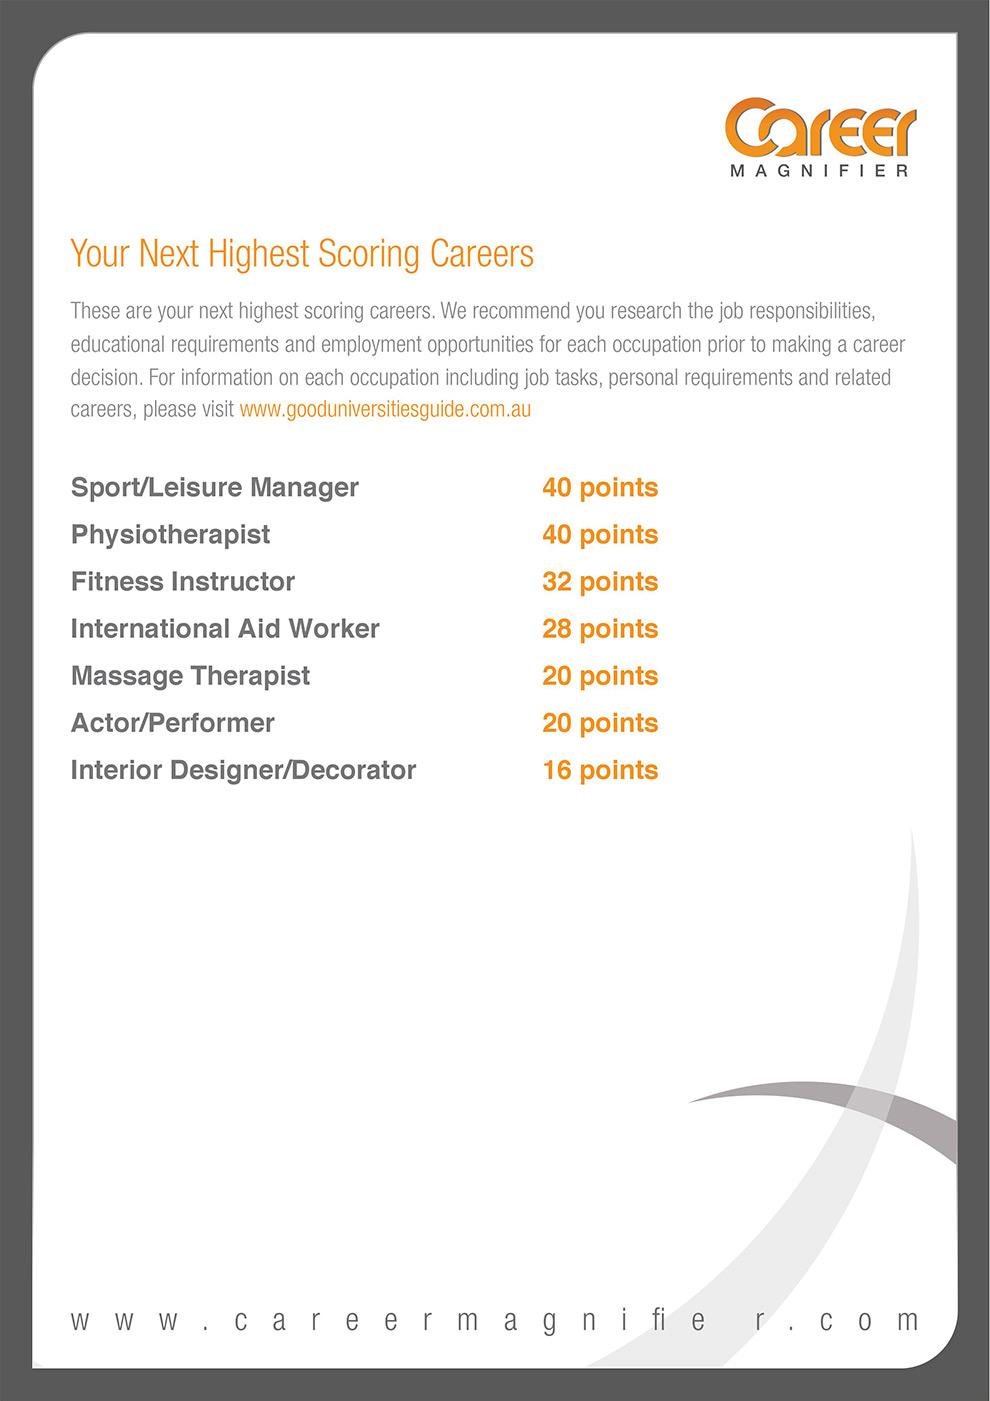 Sample Career Interests Report - Career Magnifier